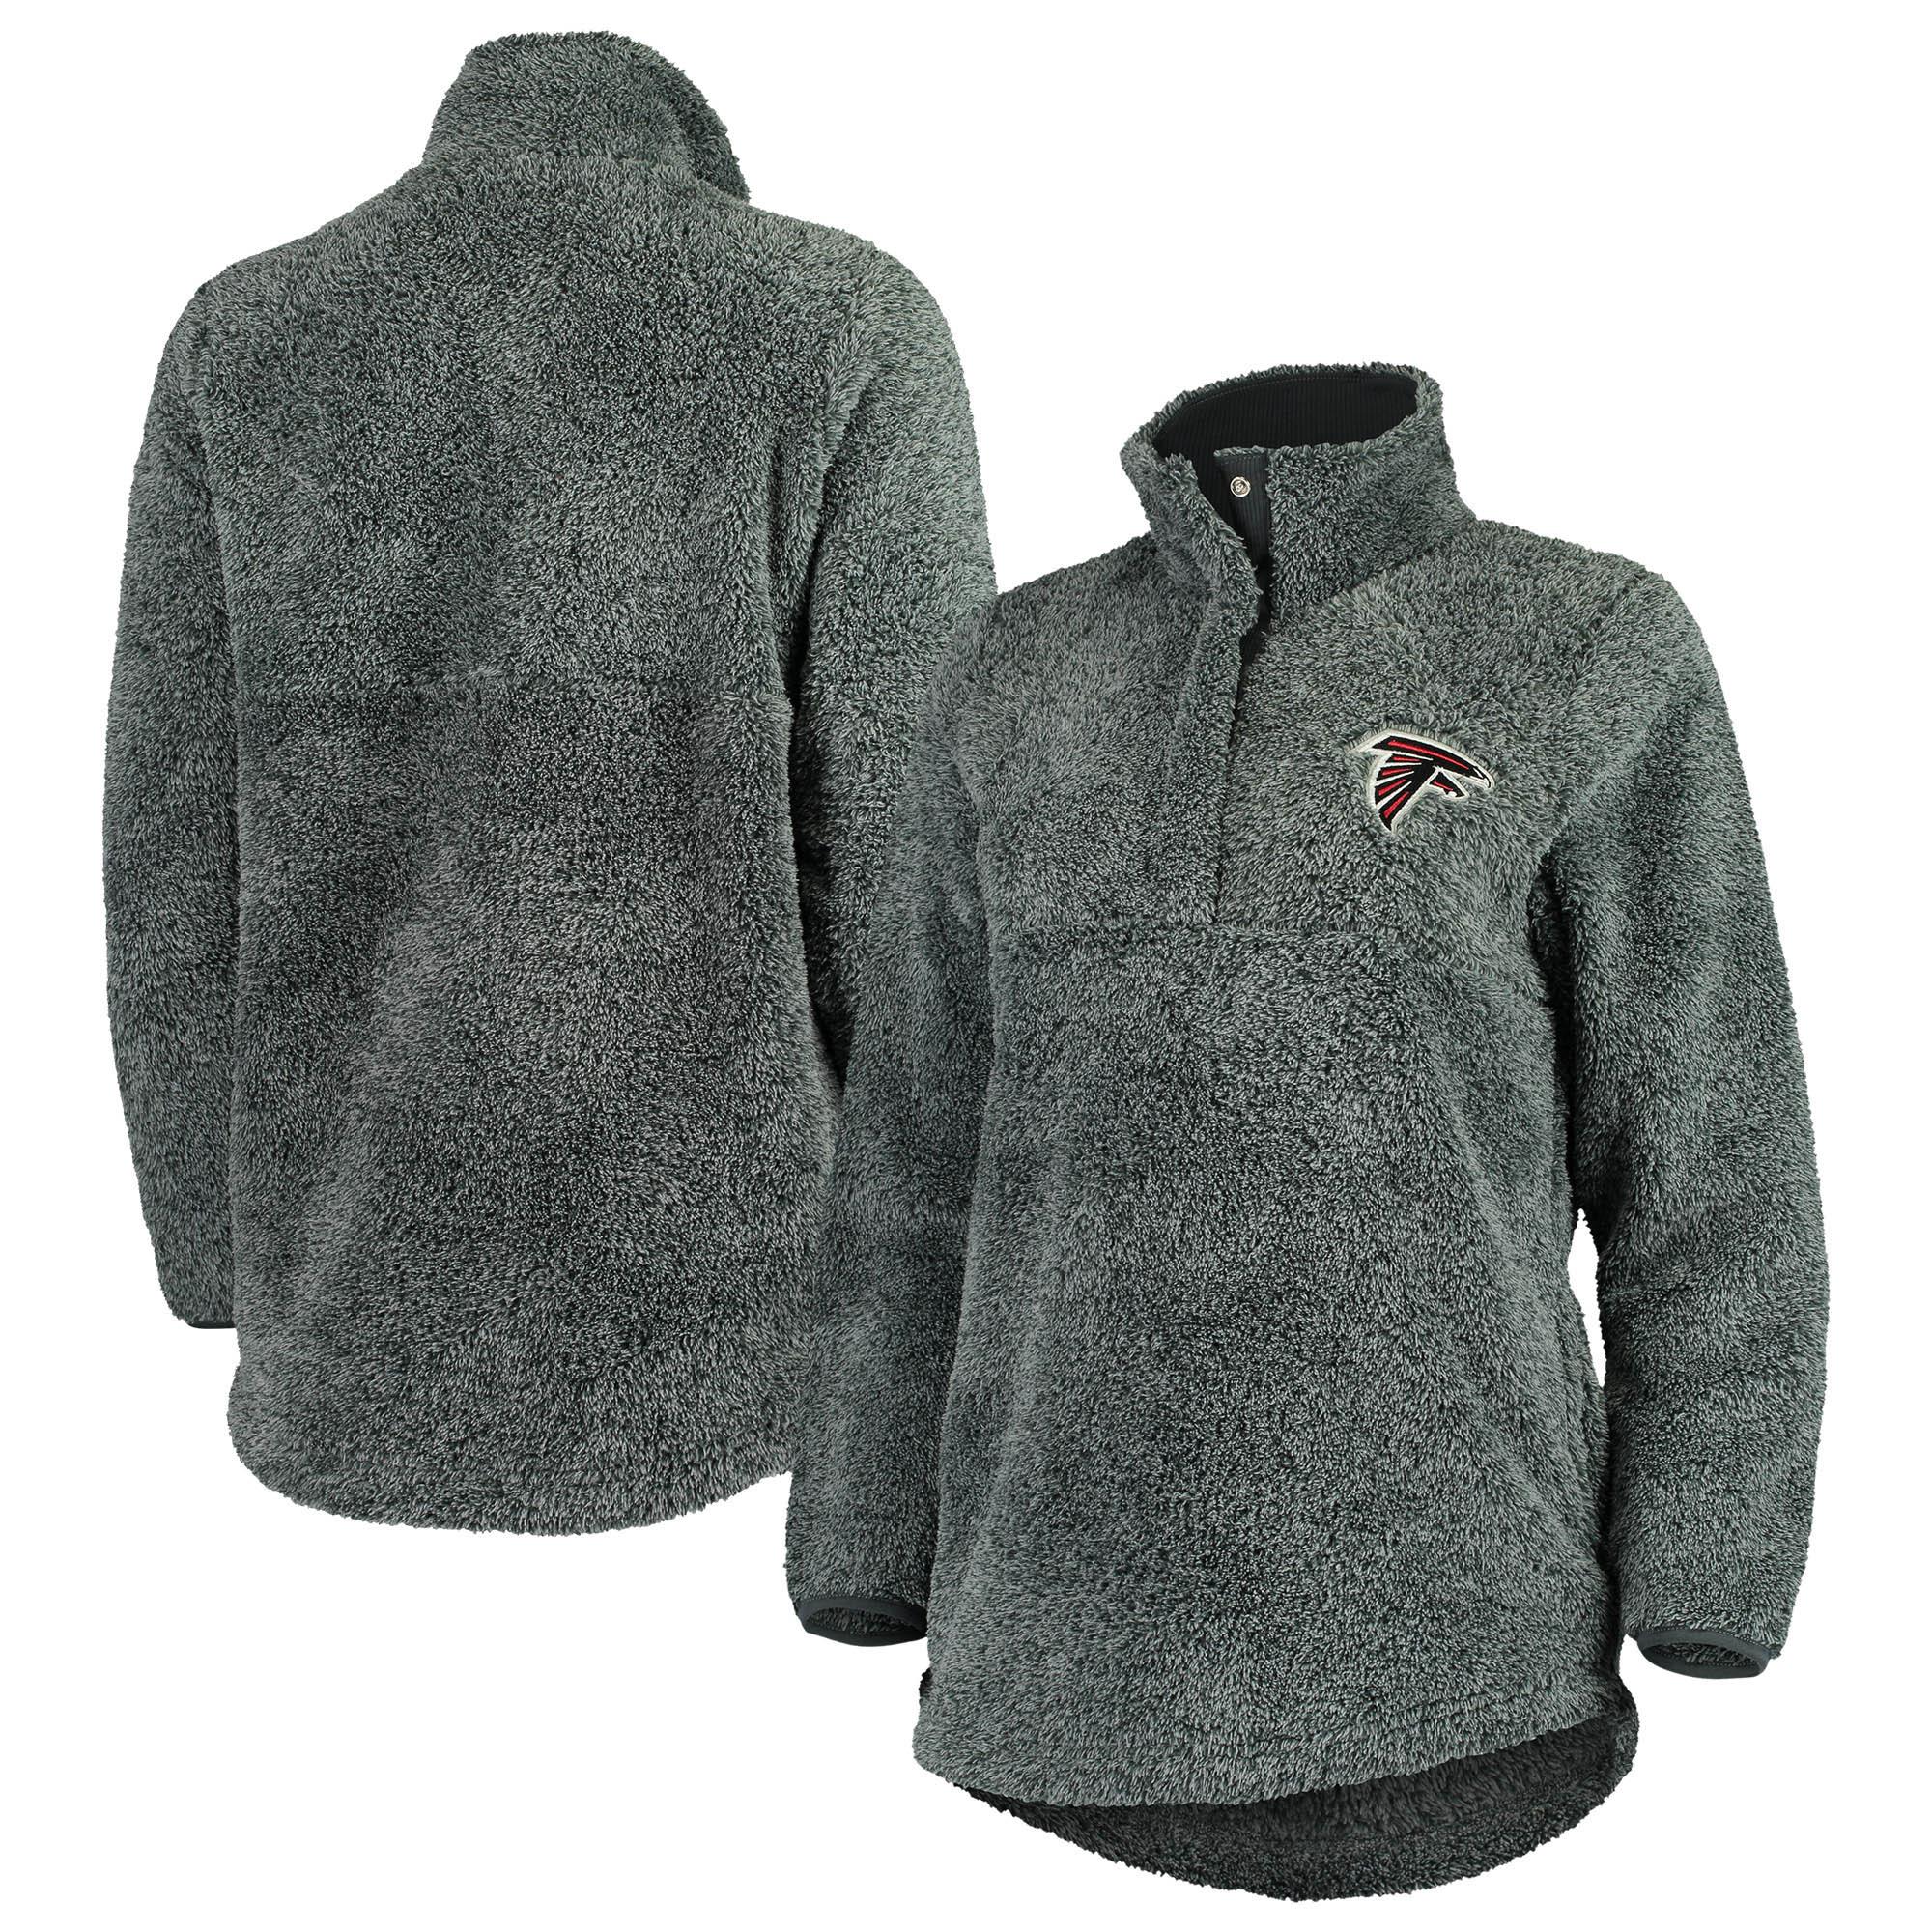 Atlanta Falcons Concepts Sport Women's Trifecta Snap-Up Jacket - Charcoal